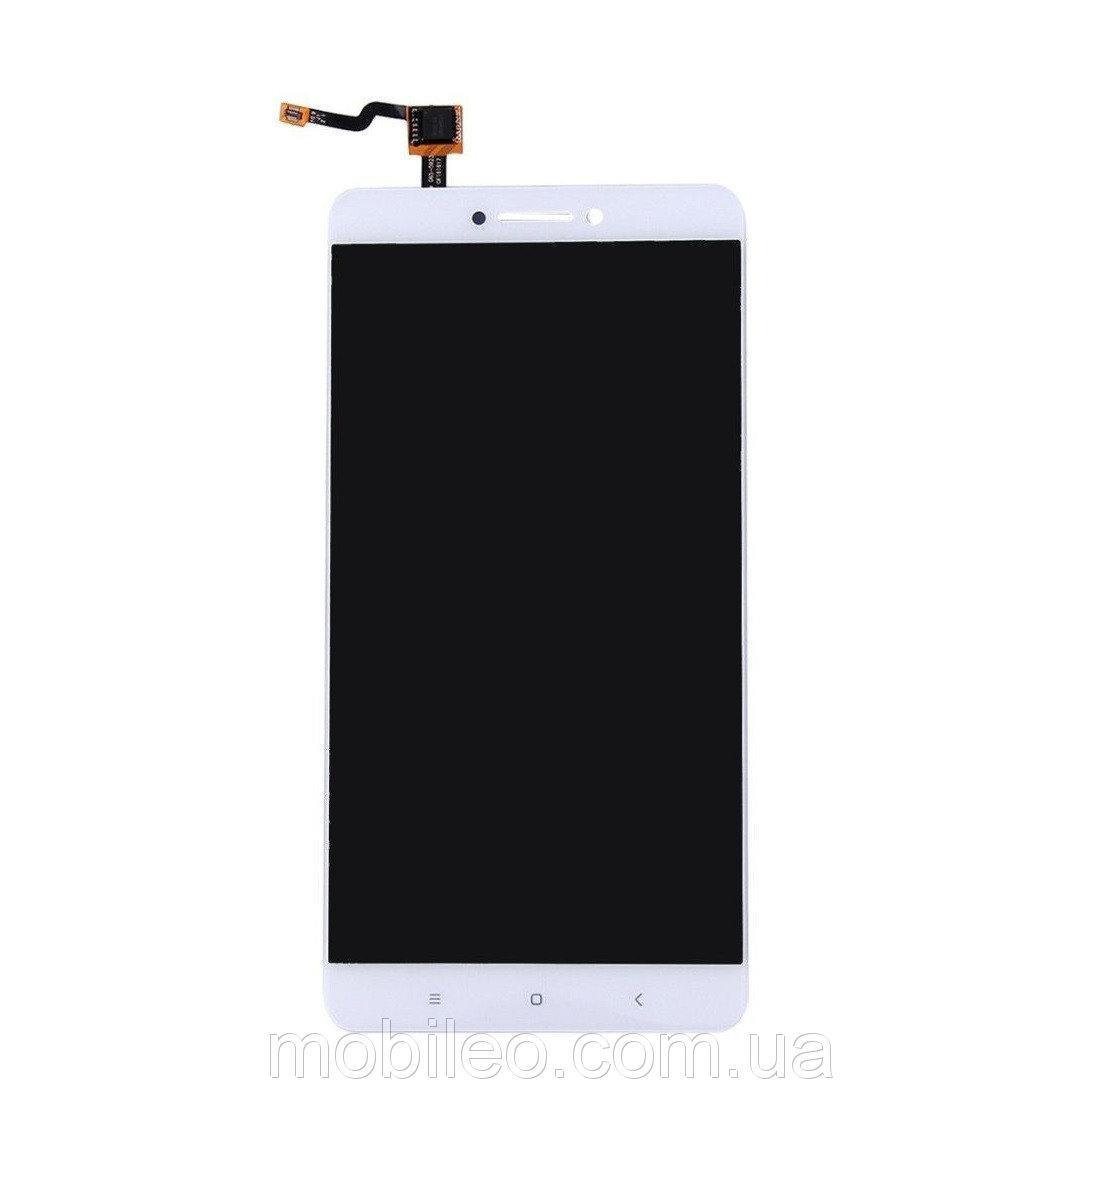 Дисплей (LCD) Xiaomi Mi Max   Mi Max Pro   Mi Max Prime с тачскрином и рамкой, белый